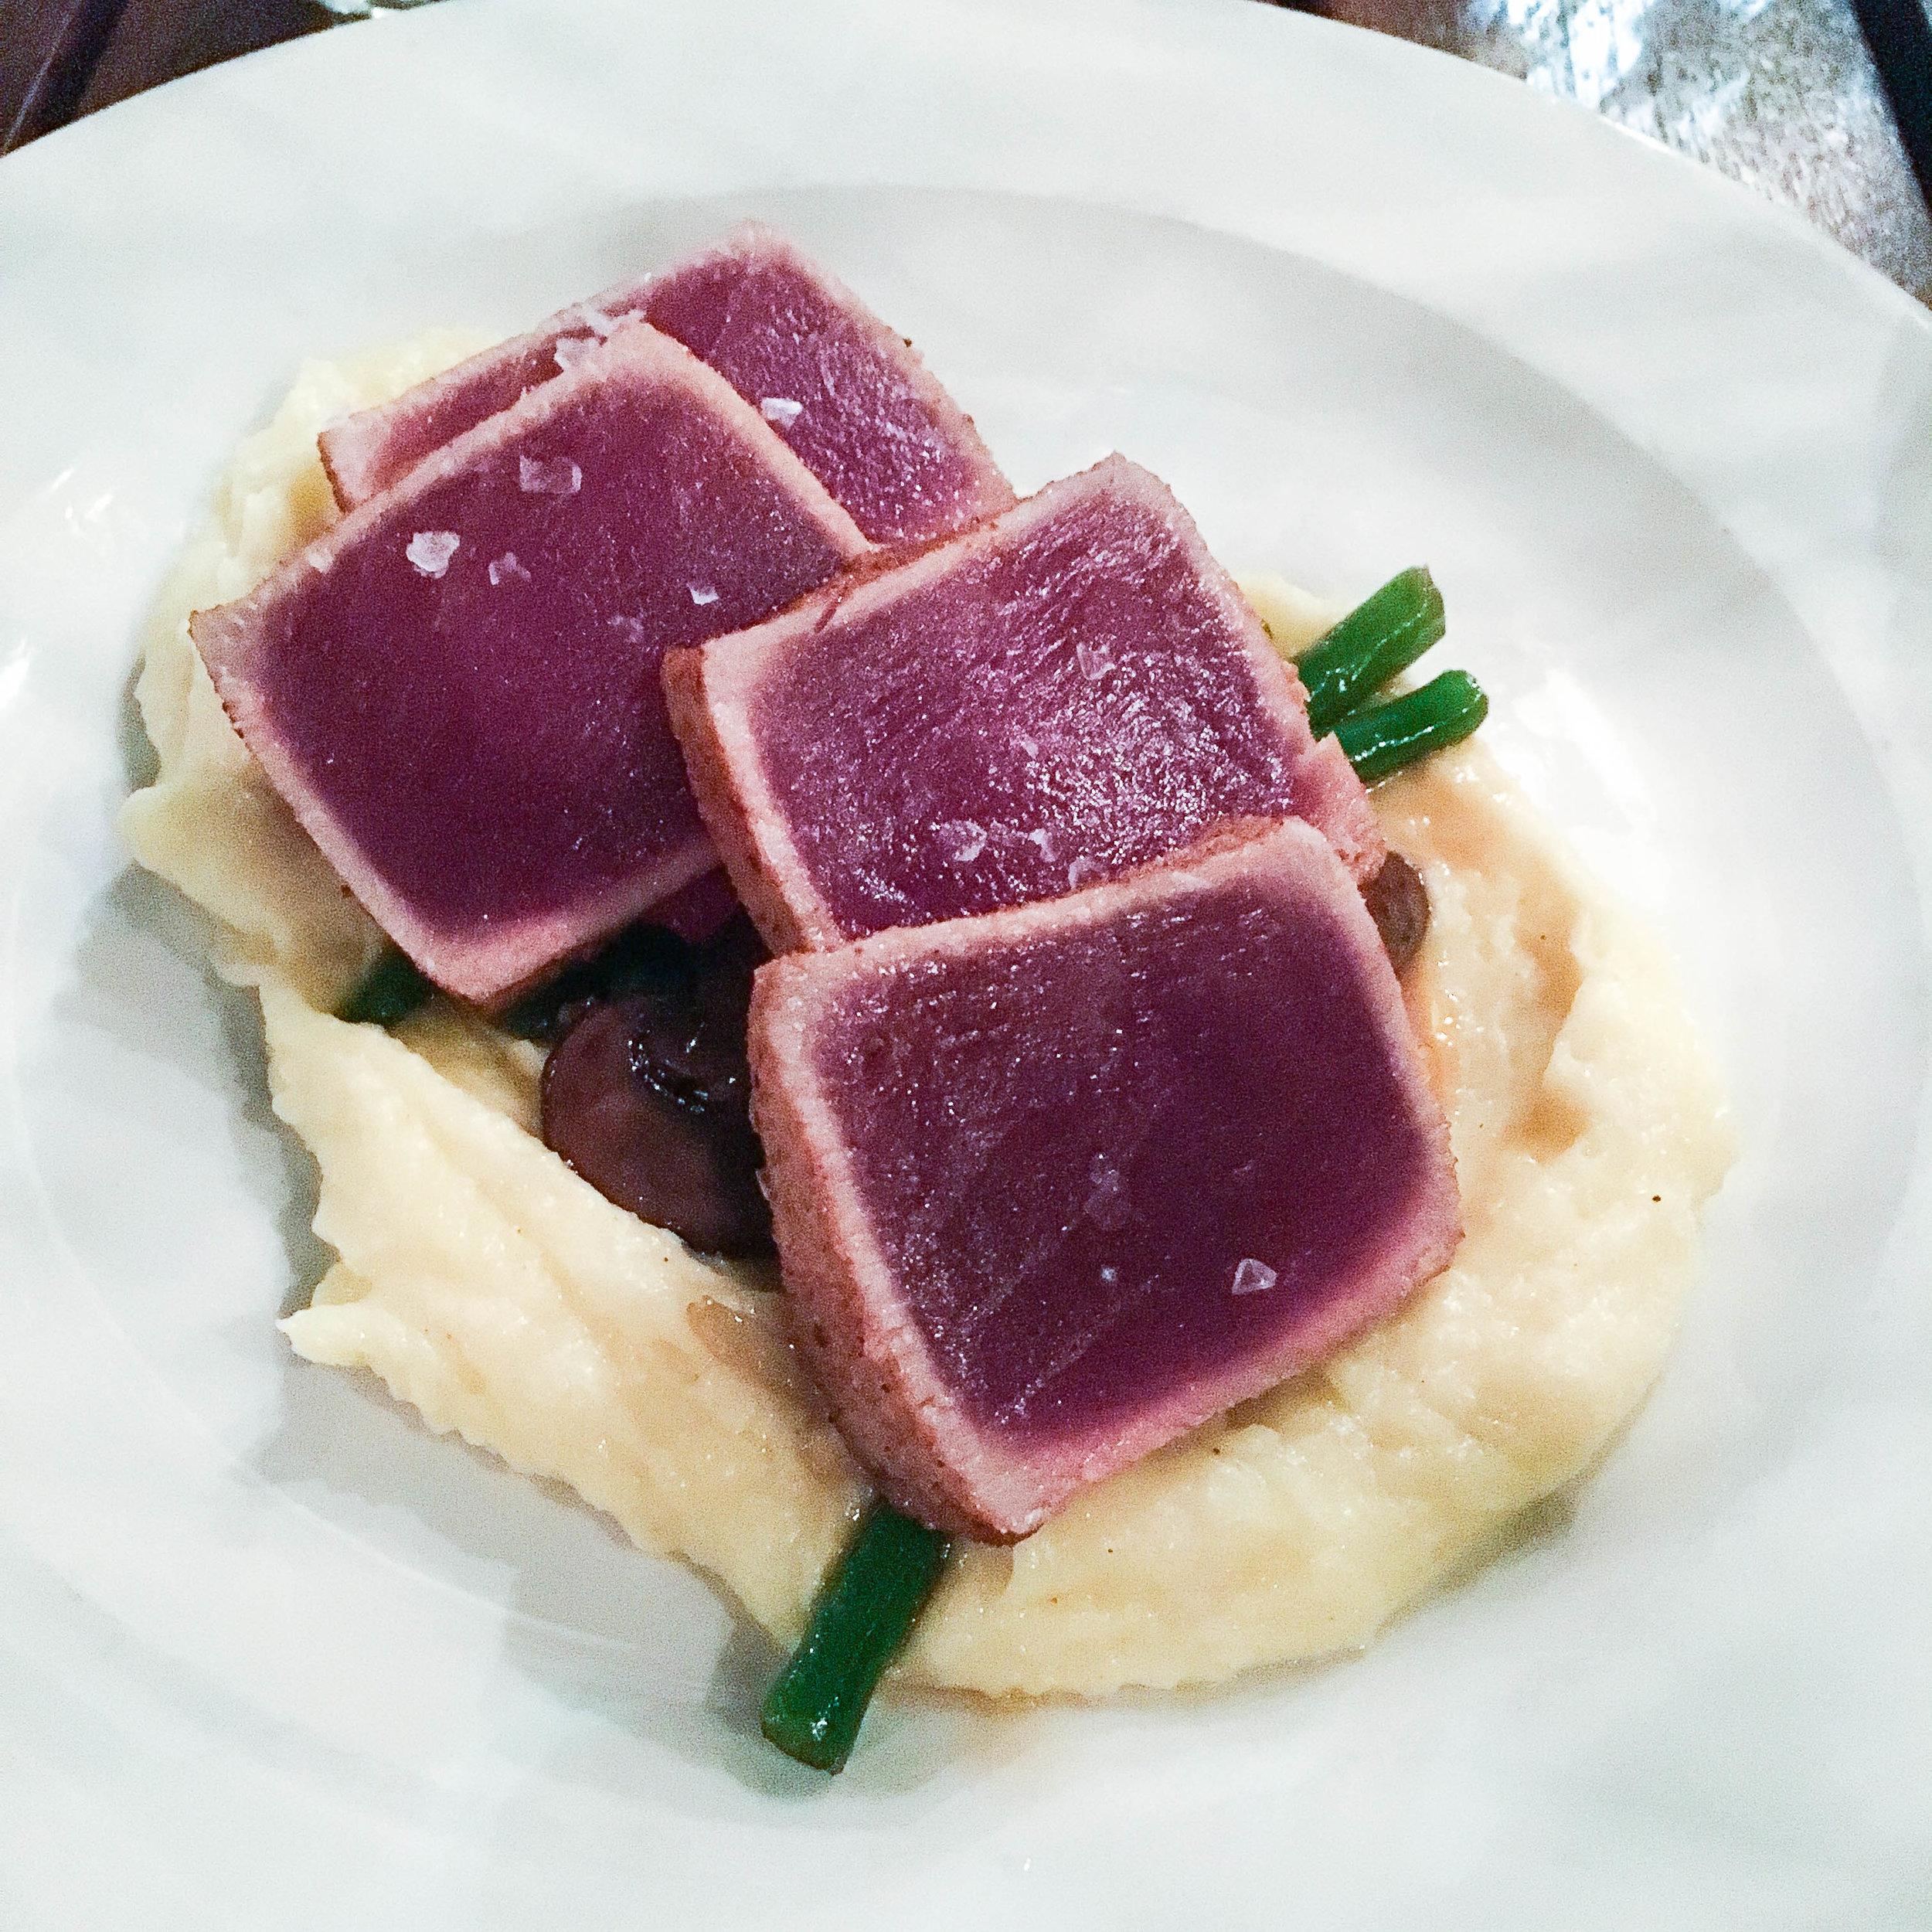 Seared tuna loin with mashed potatoes, mushrooms and succotash